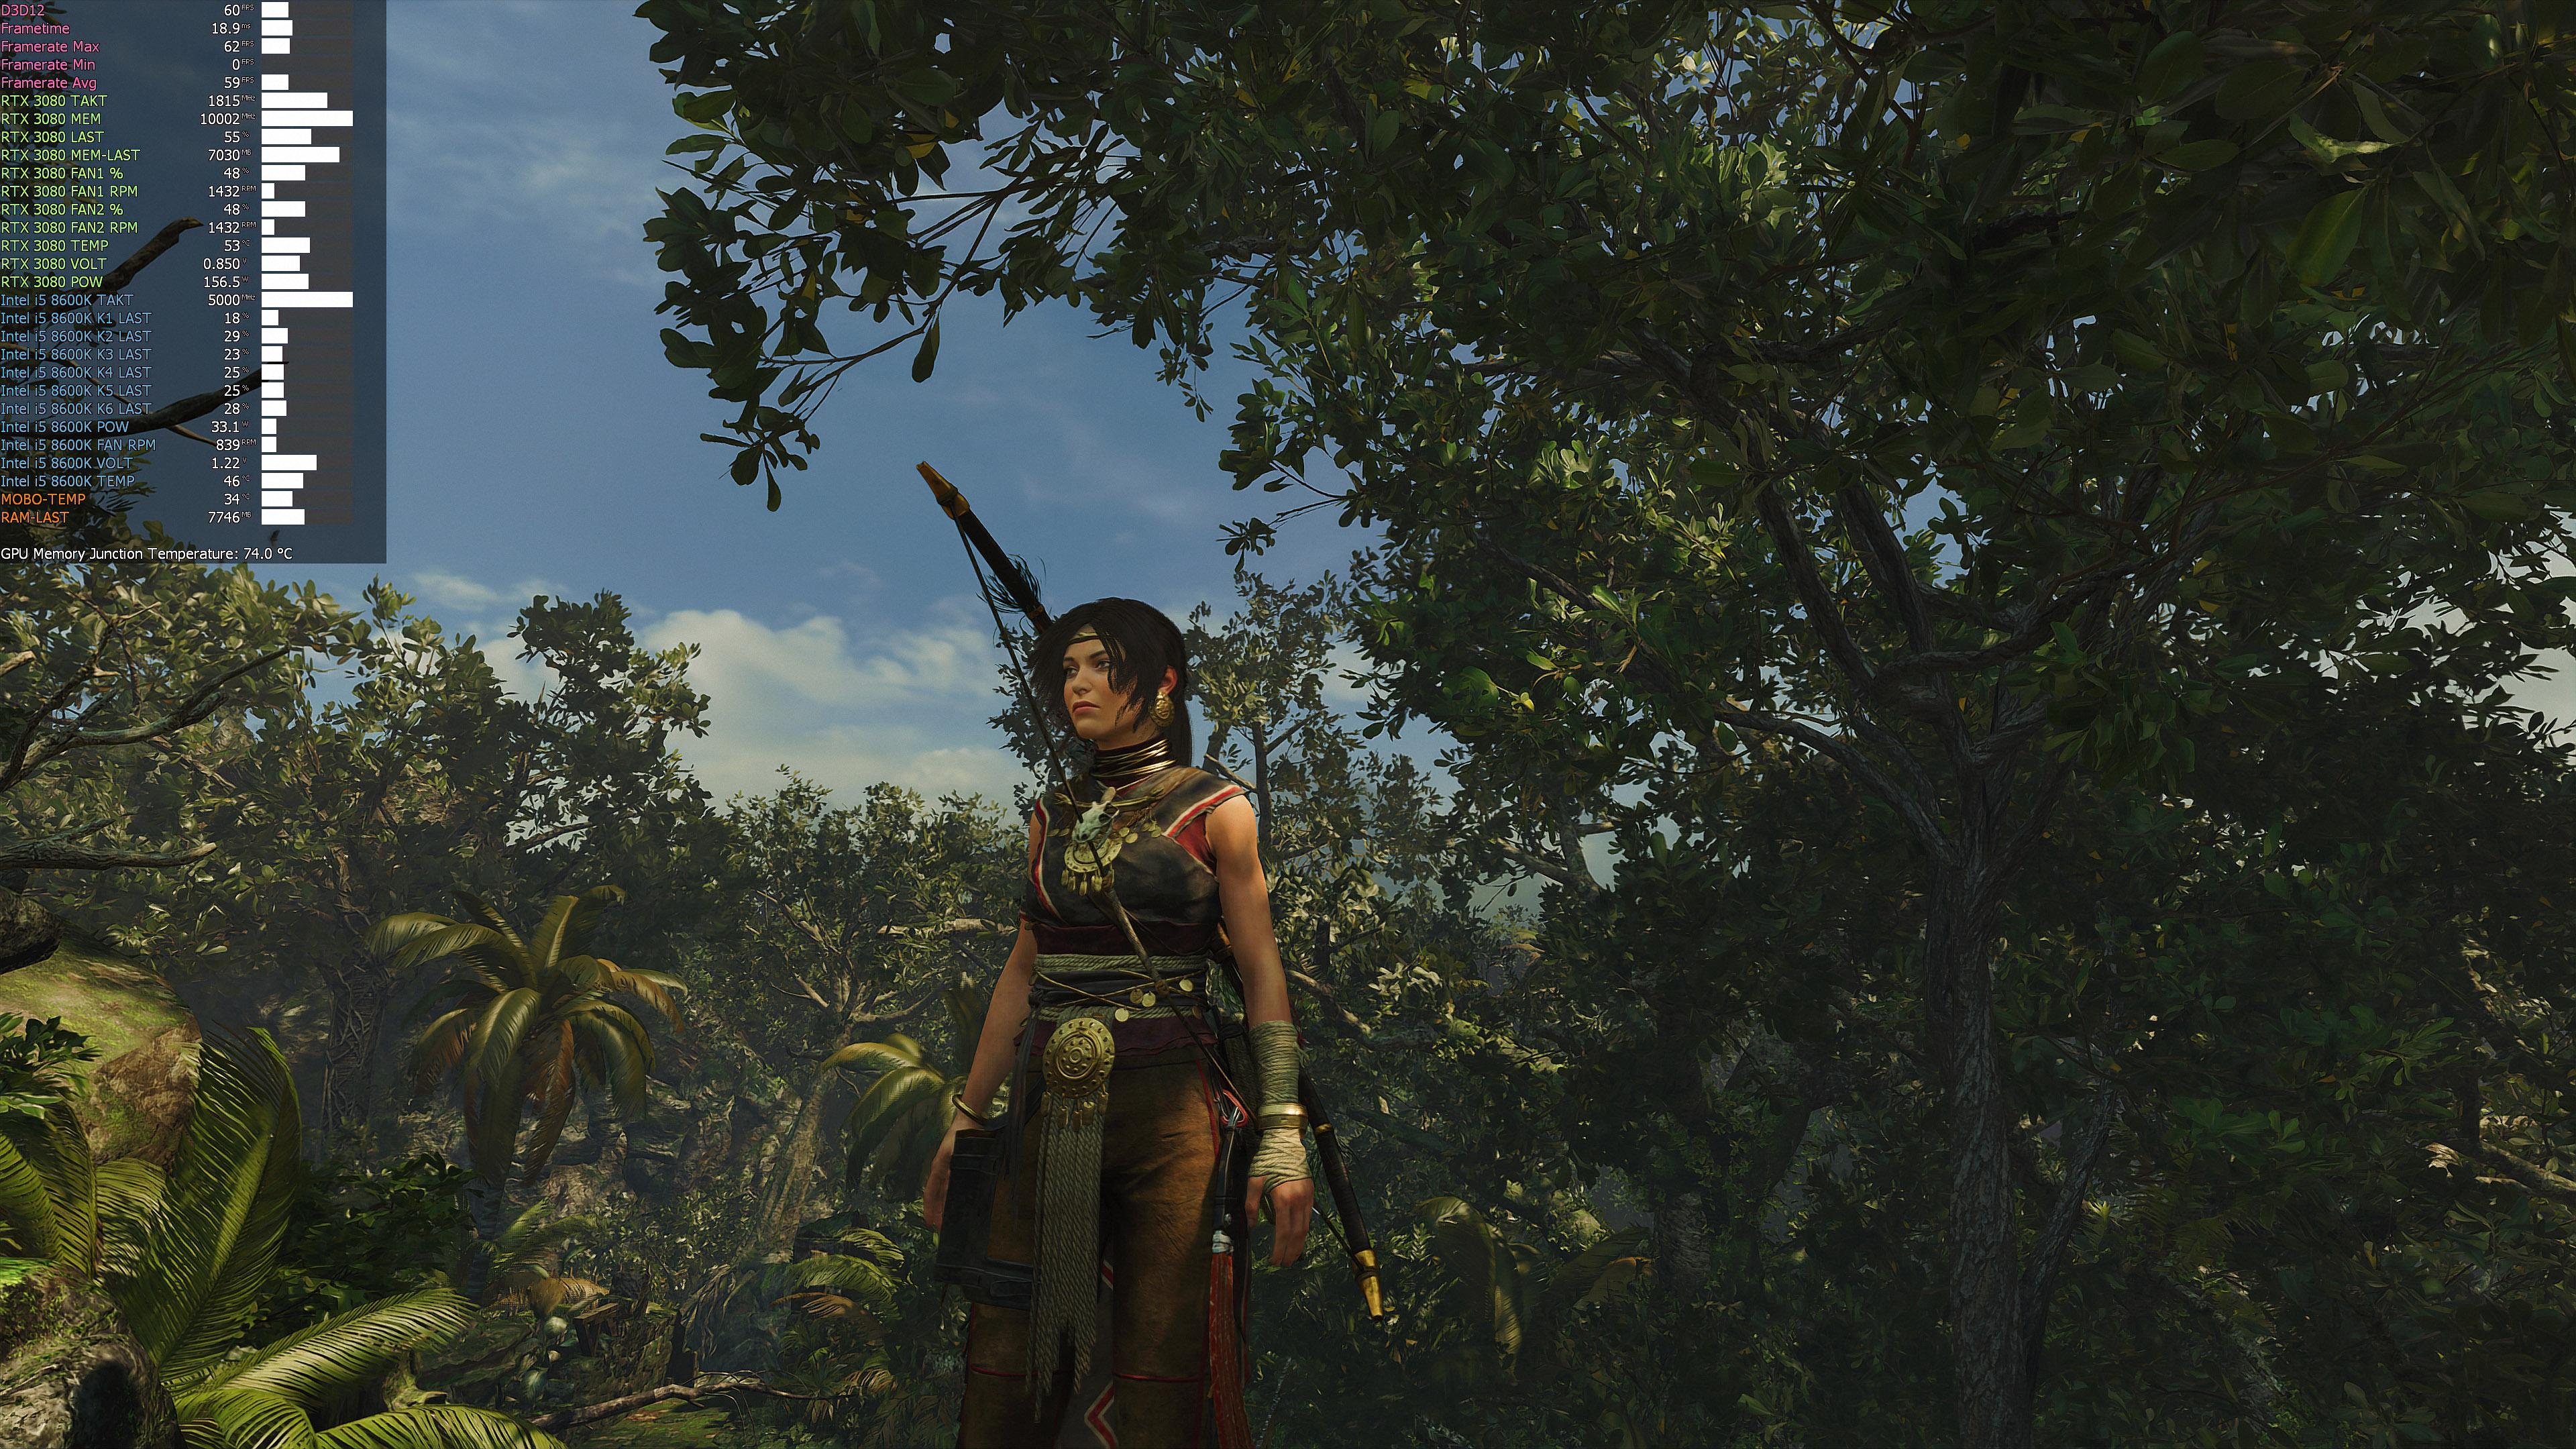 Shadow of the Tomb Raider Screenshot 2021.02.08 - 22.59.13.39.jpg